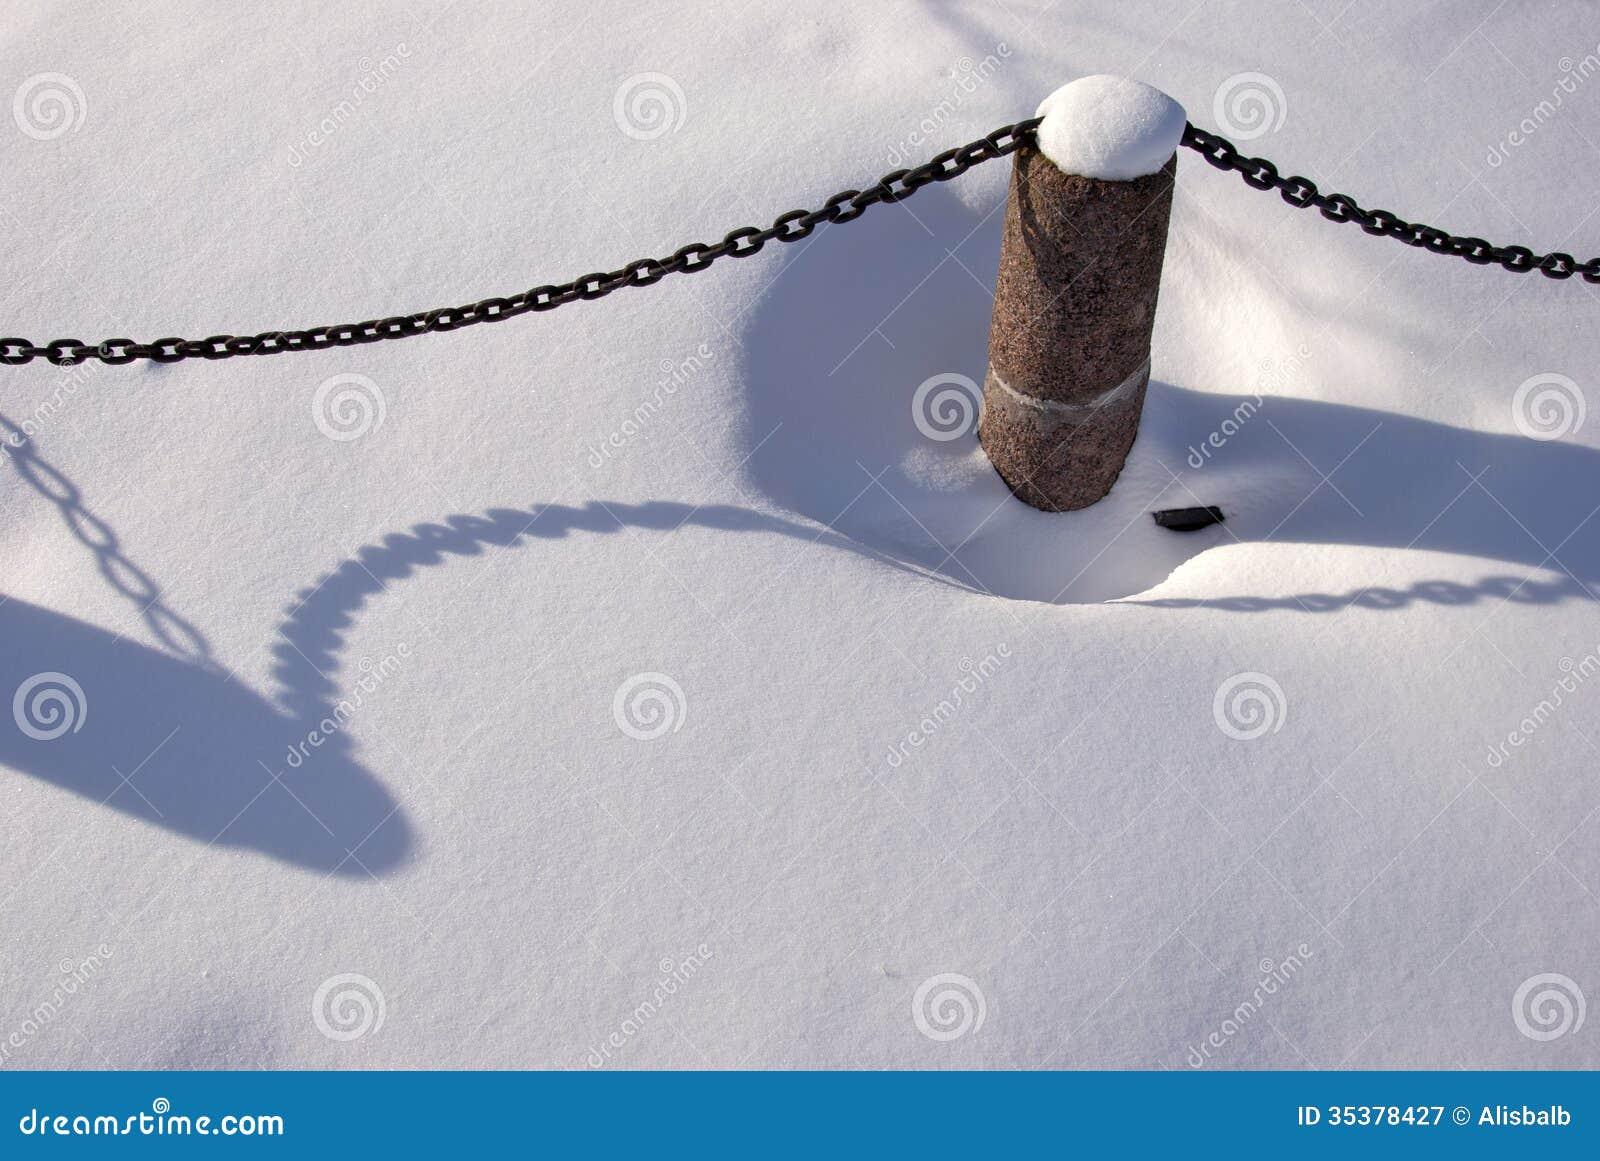 Granite Bollard With Metal Chain In Snow Stock Image - Image